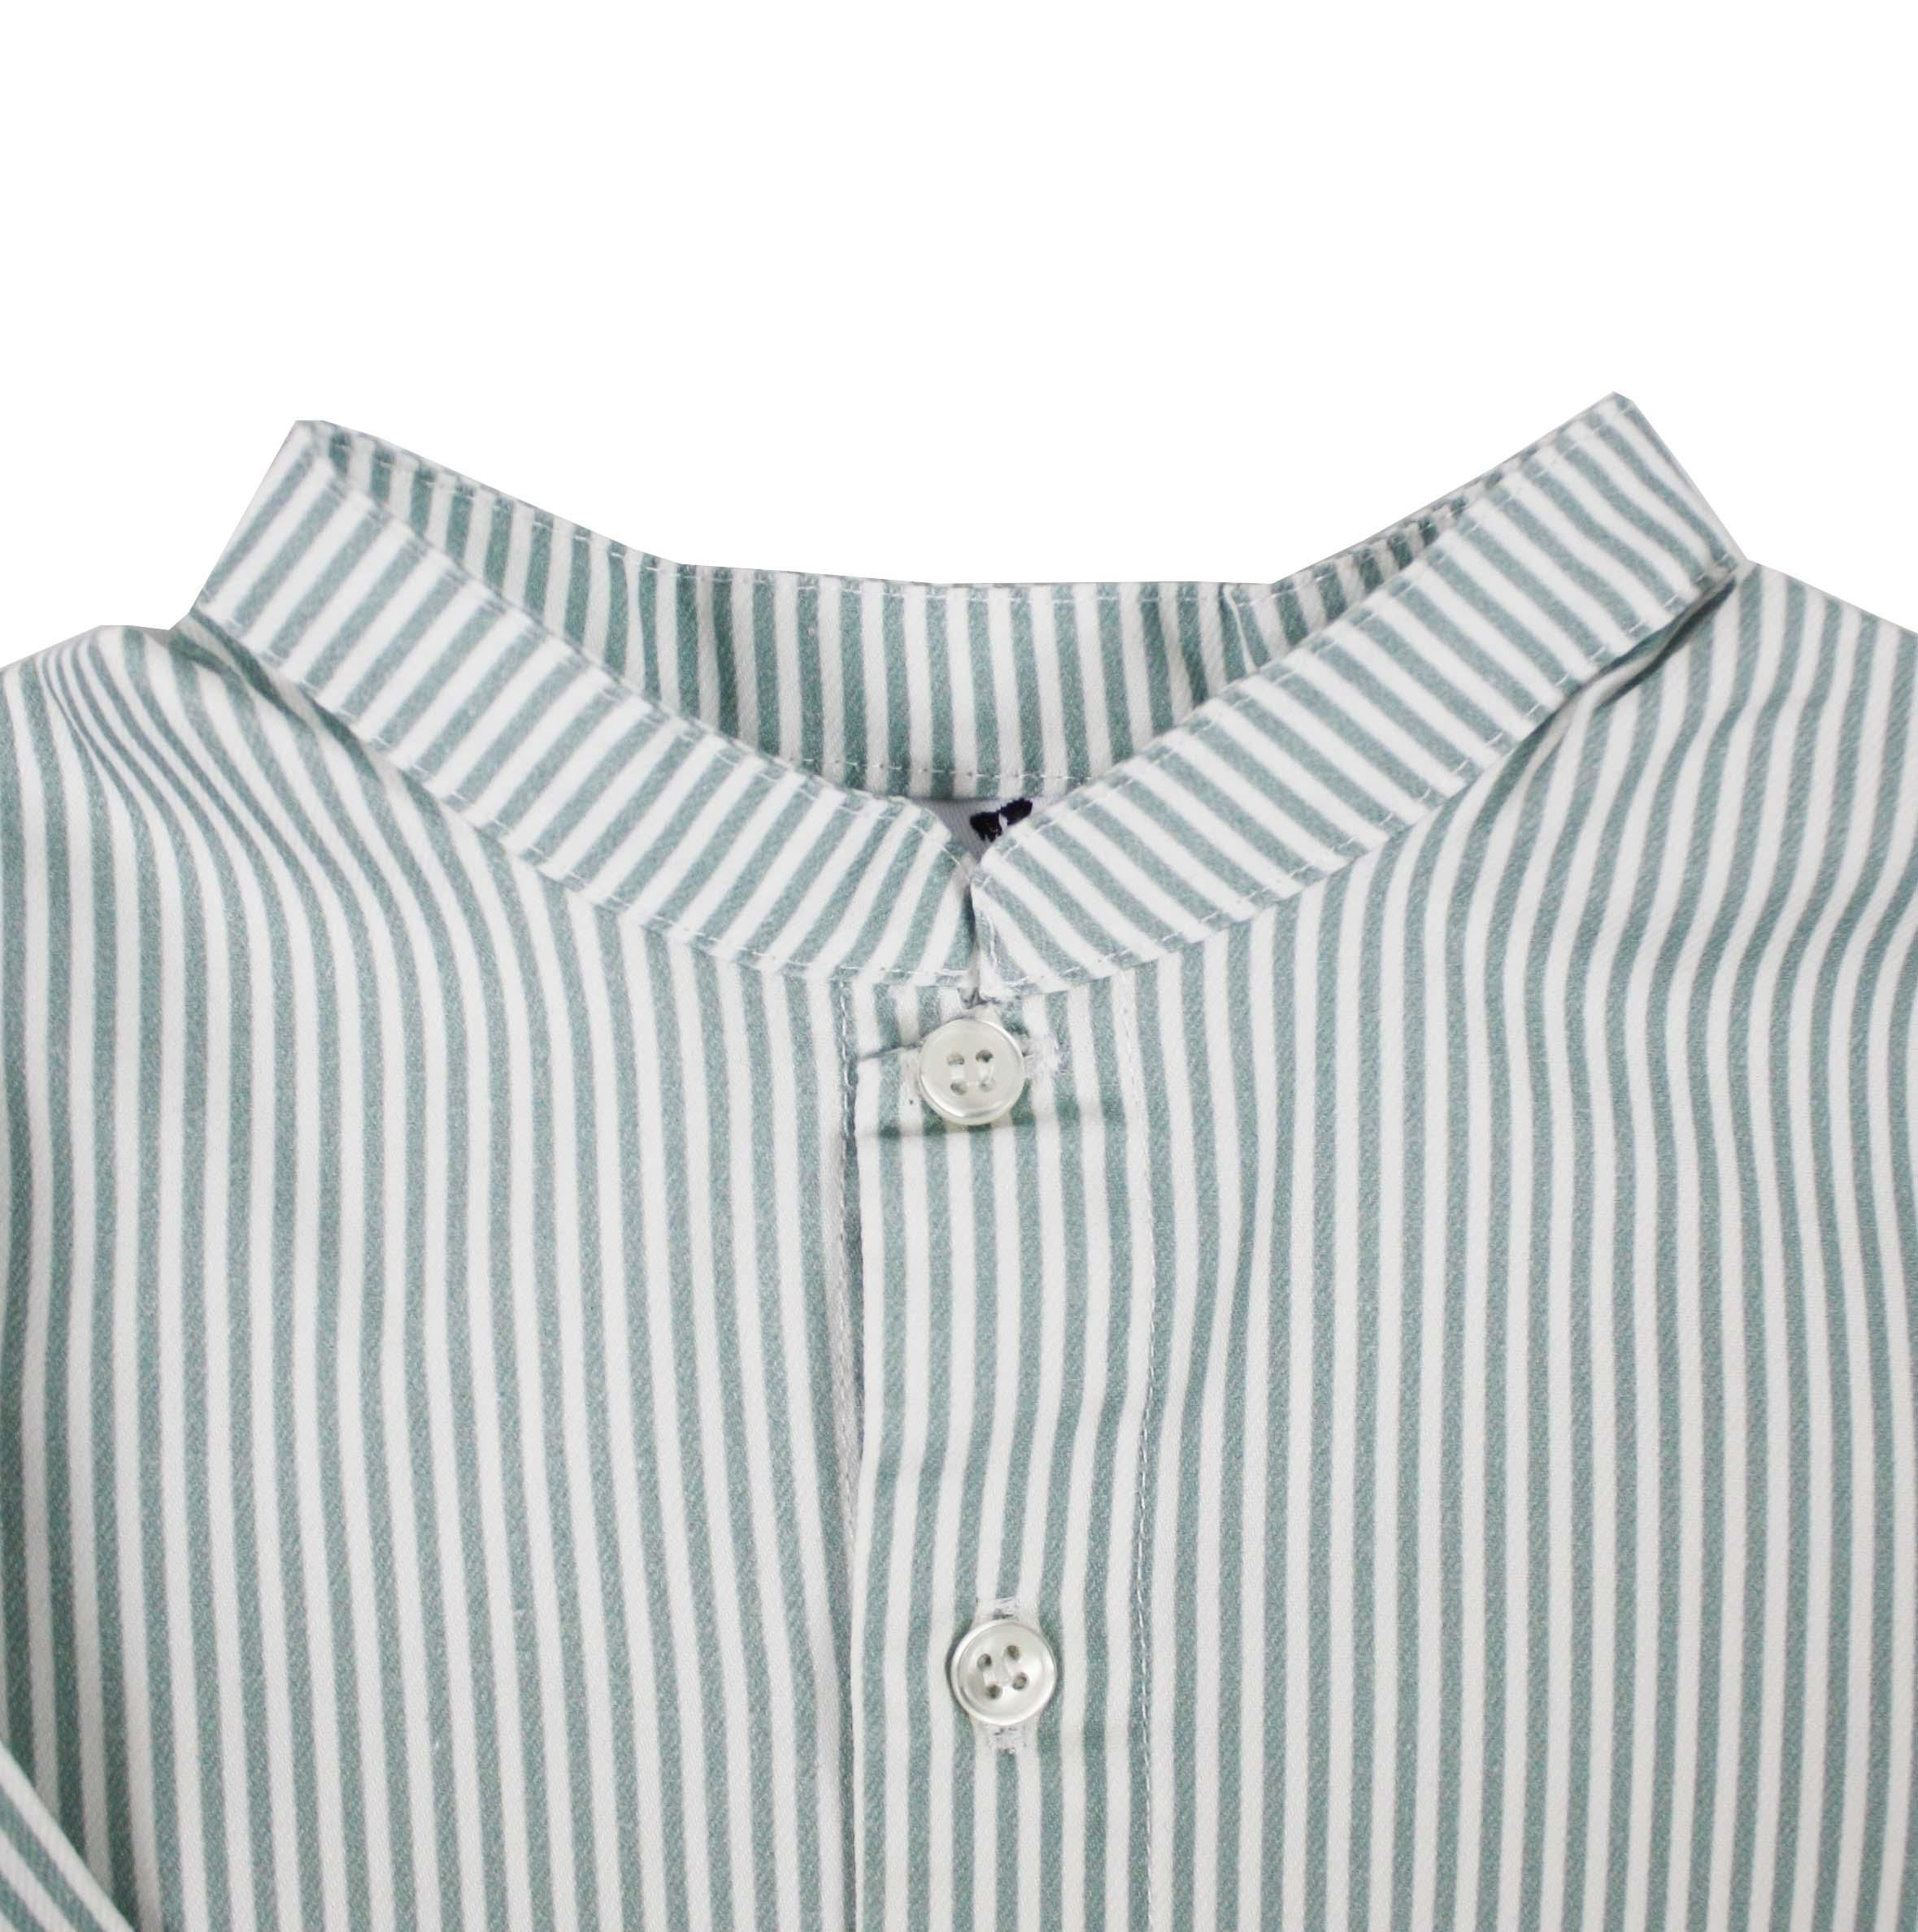 cc3f23fdb1 Camisa niño cuello Mao manga larga raya verde